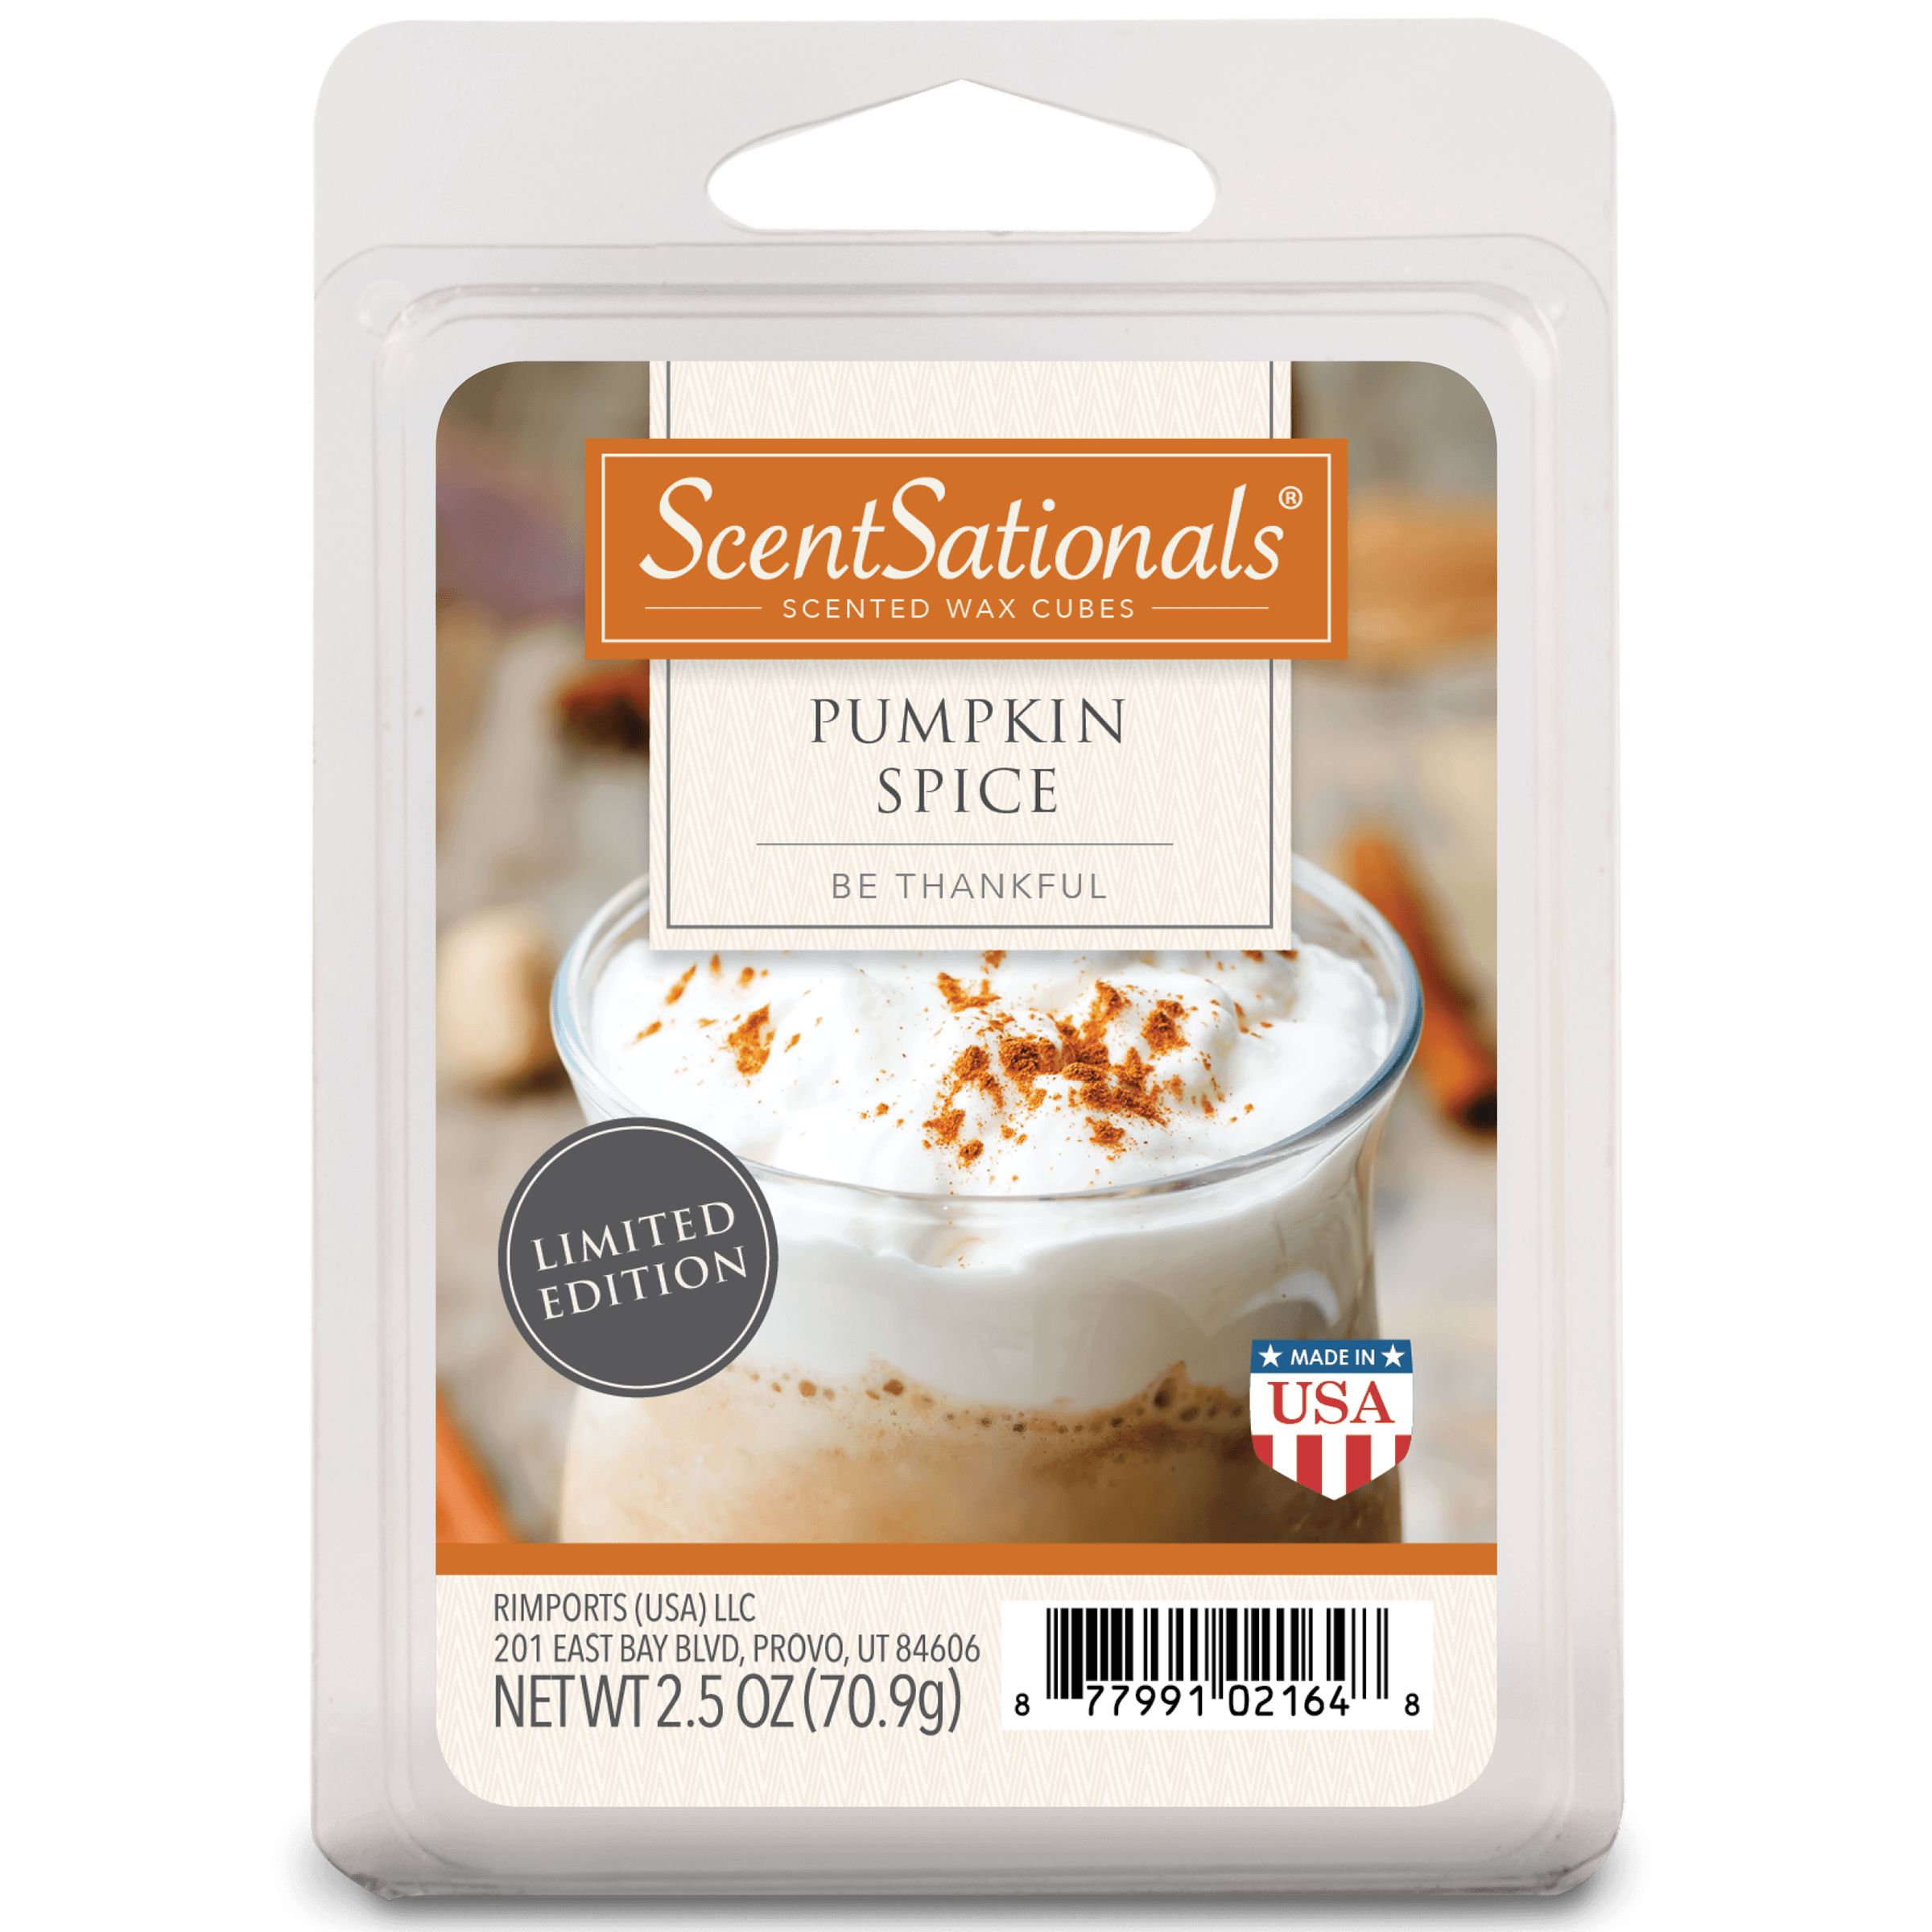 ScentSationals Scented Wax Cubes Pumpkin Spice